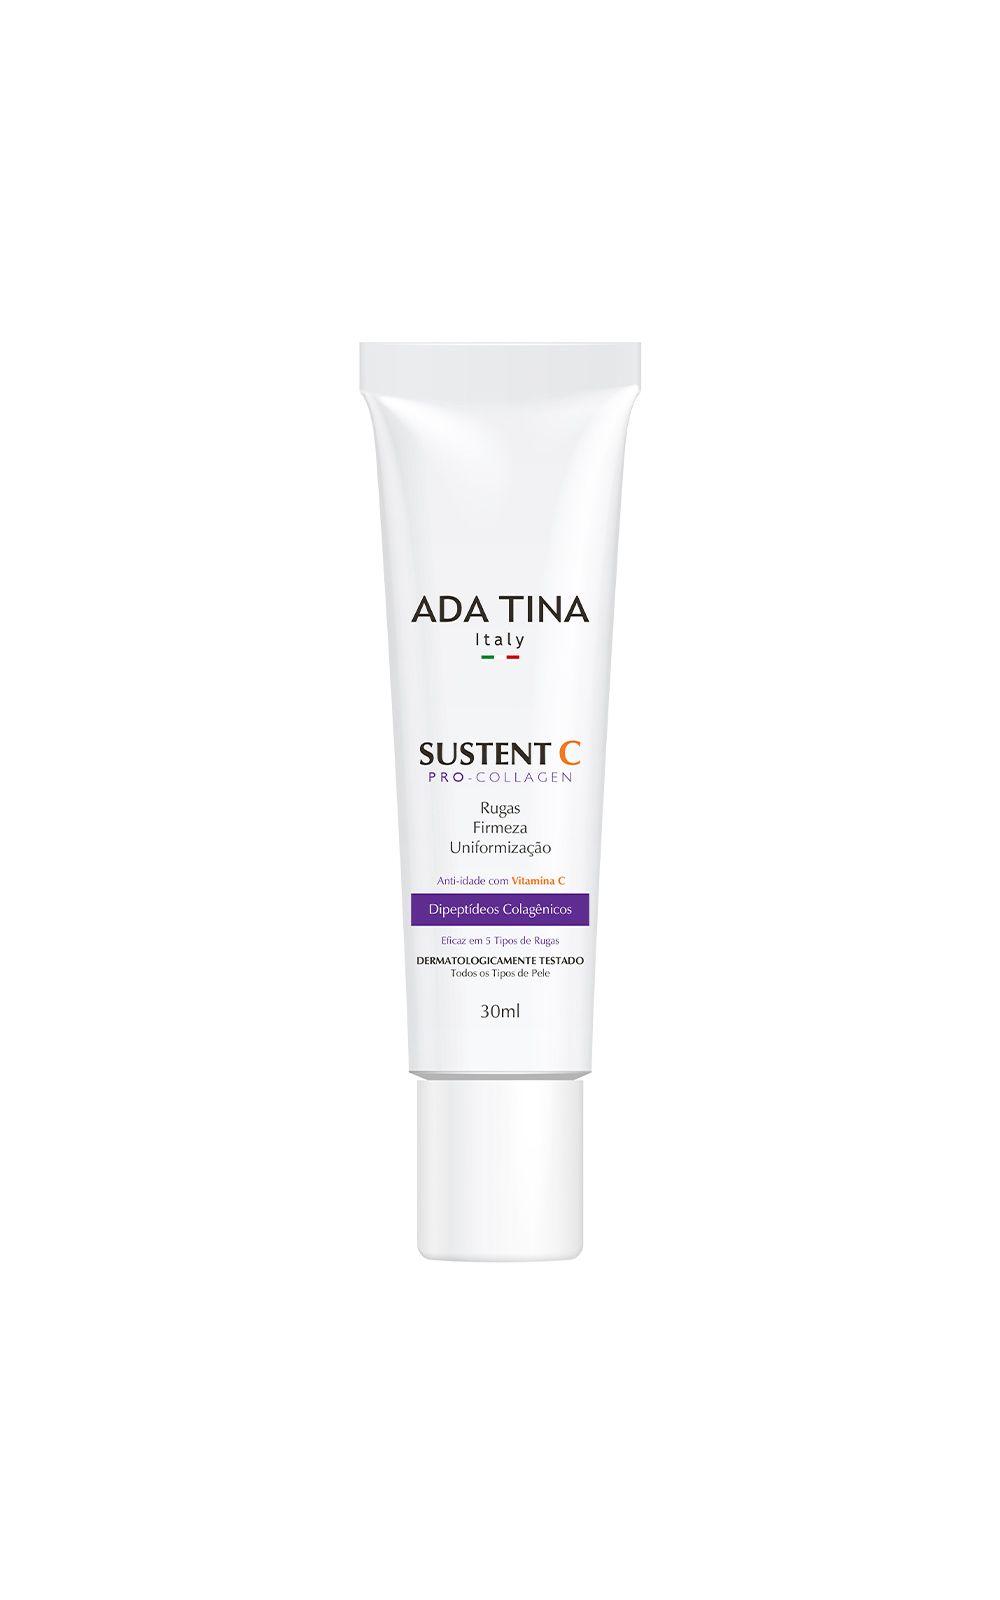 Foto 1 - Rejuvenescedor Facial Ada Tina Sustent C Pro Collagen - 30ml